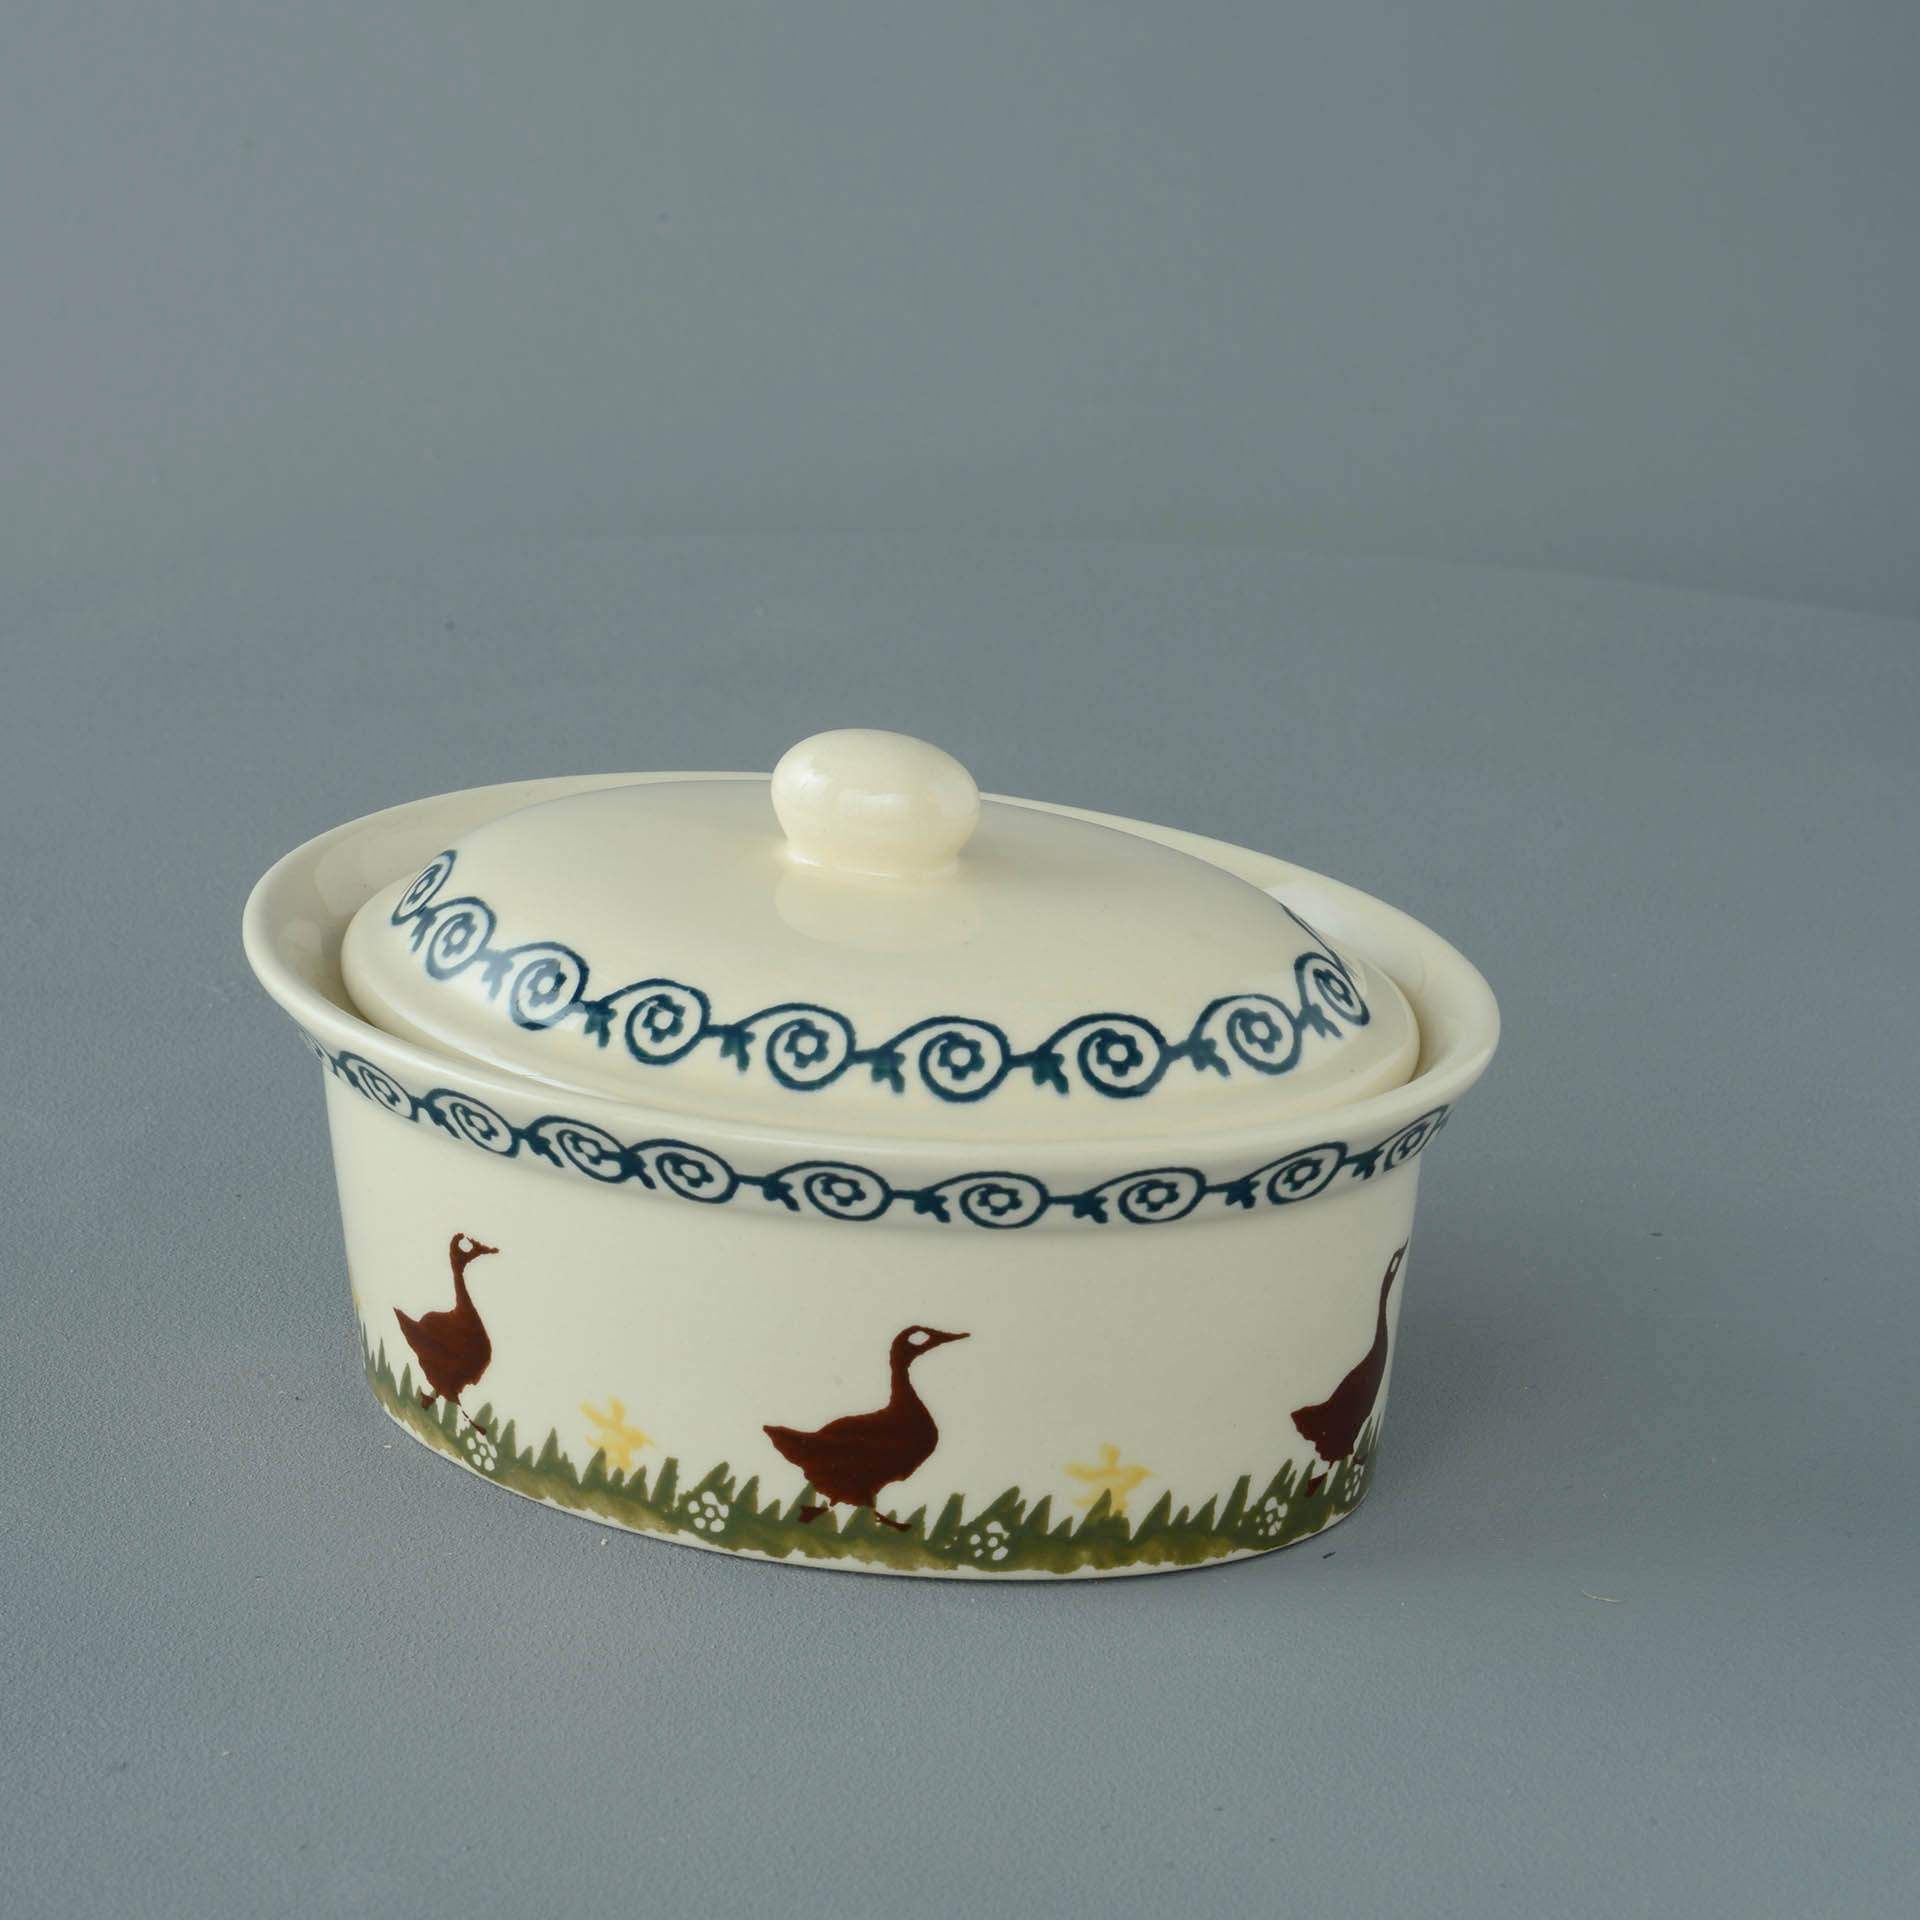 Ducks Butter Dish Oval 16.3 x 12 x 8.5cm